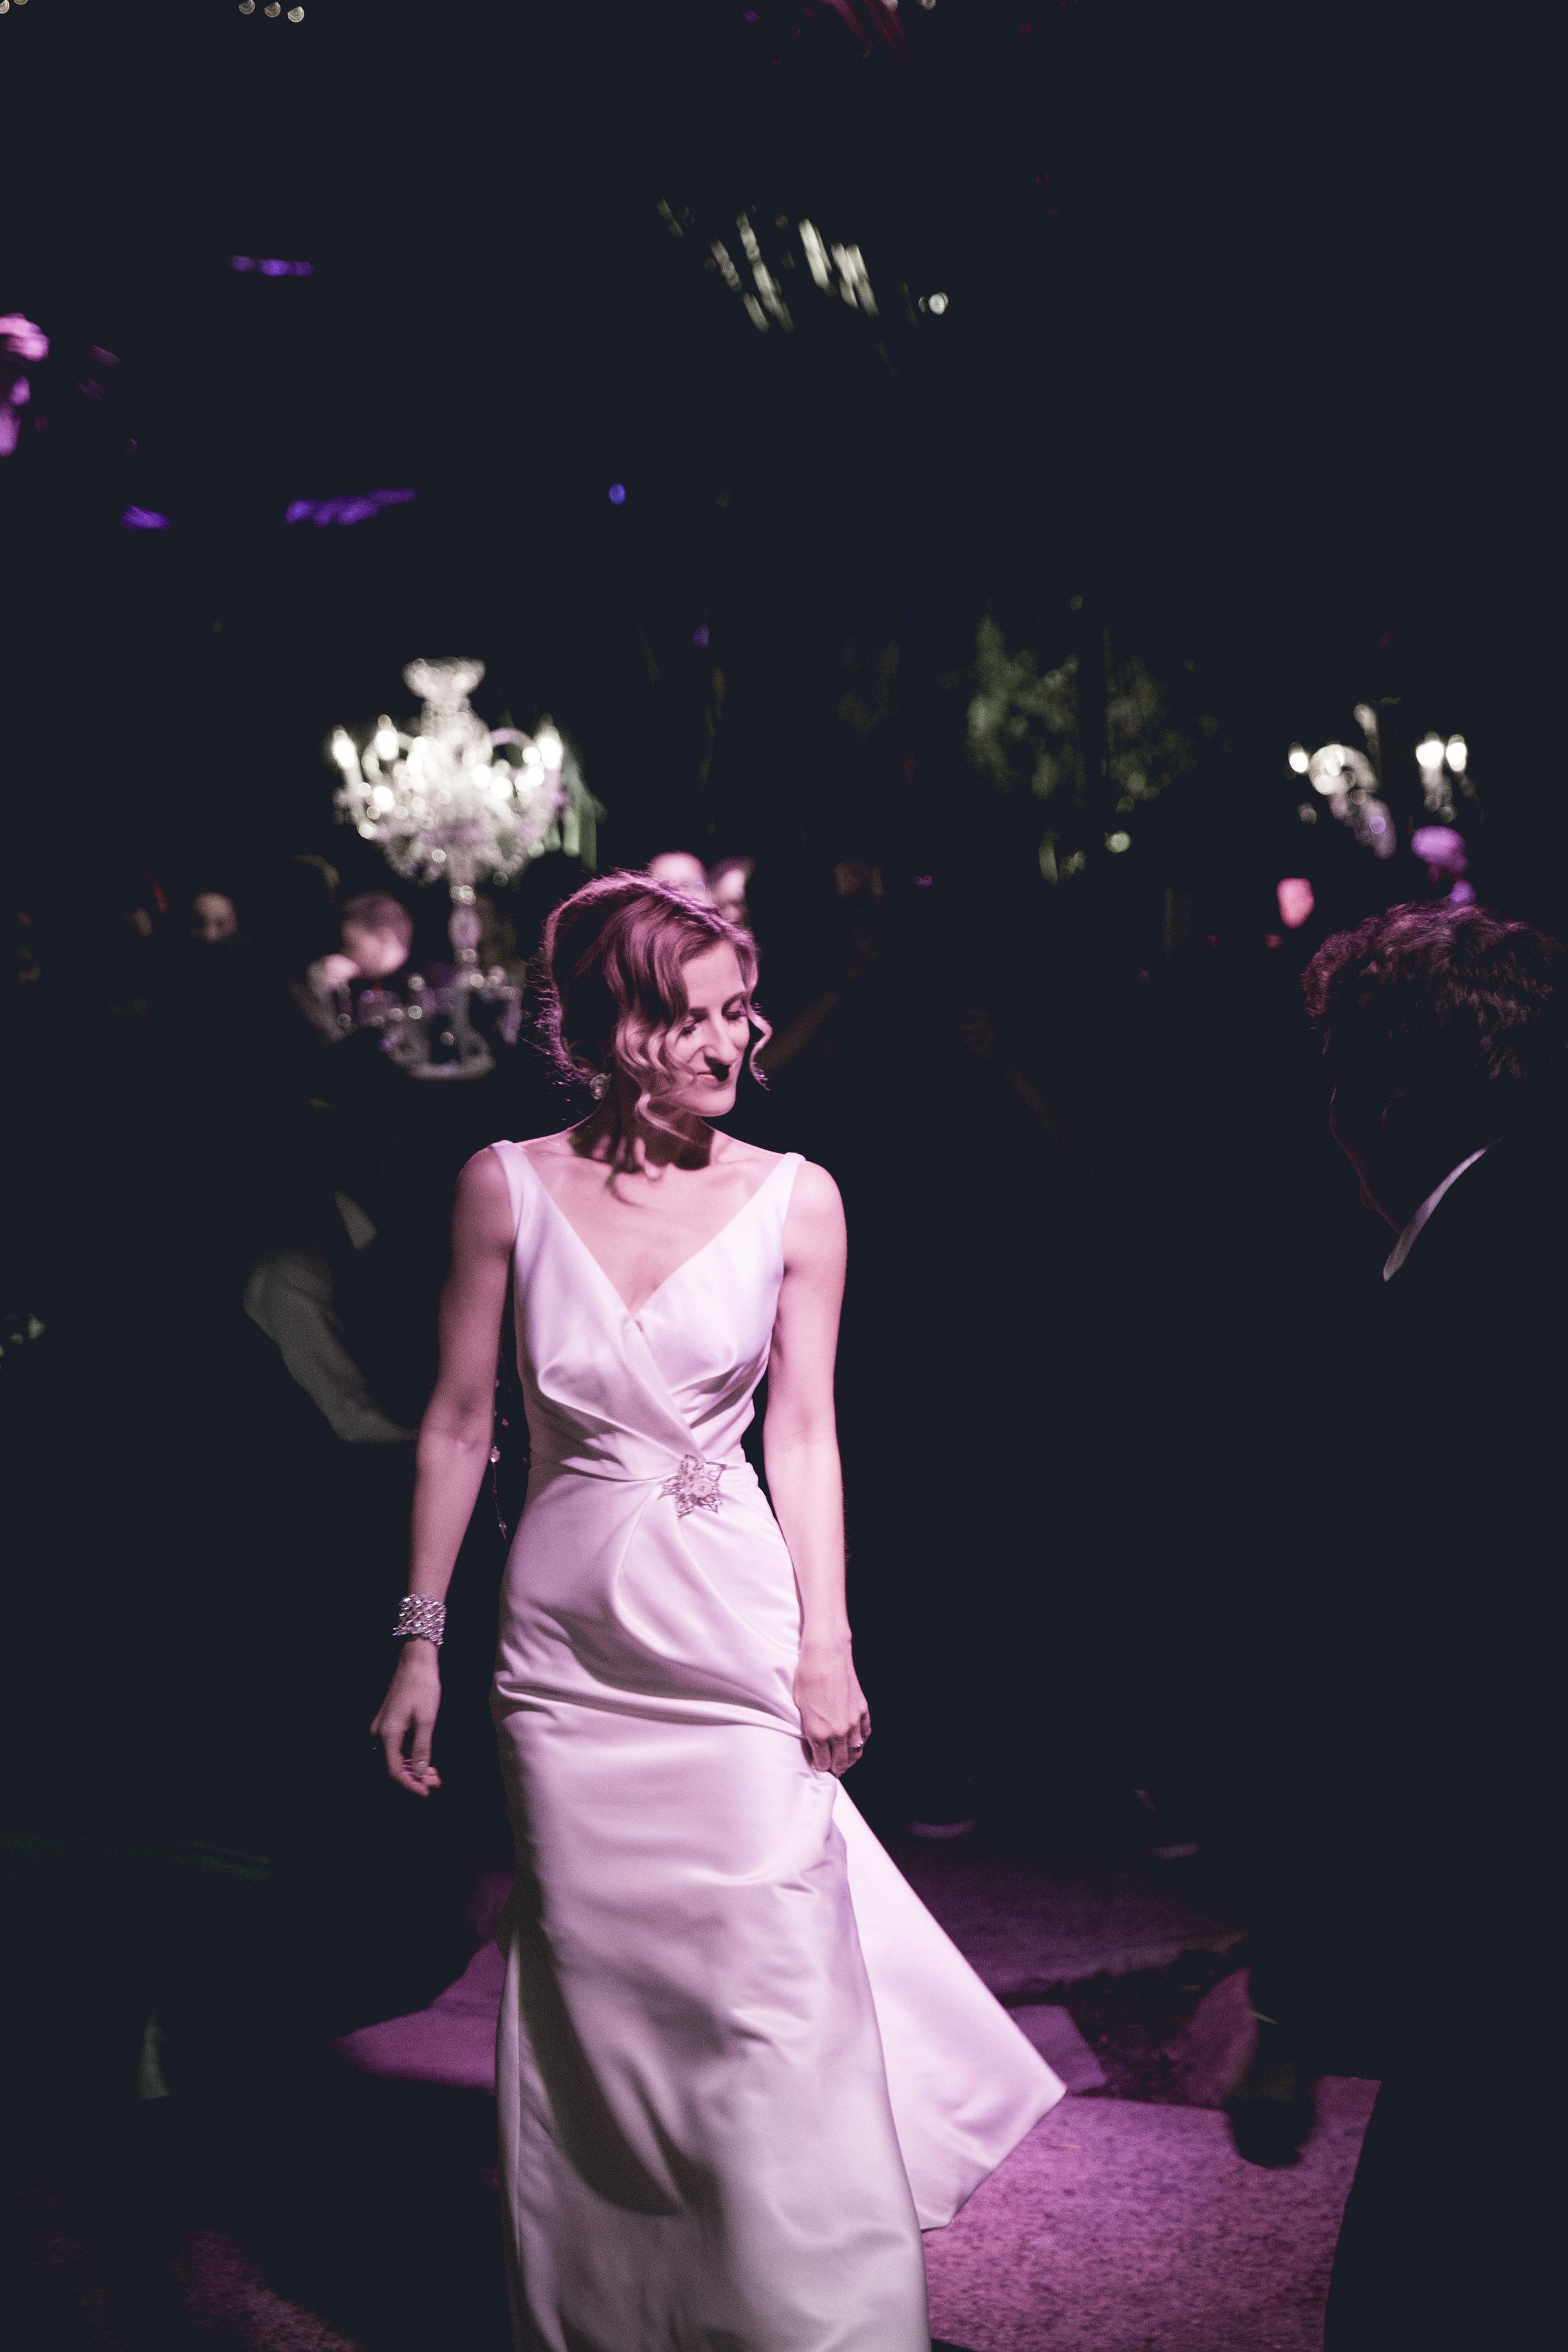 Chris Kristen October 2015 Wedding-Chris Kristen October 2015-0113.jpg